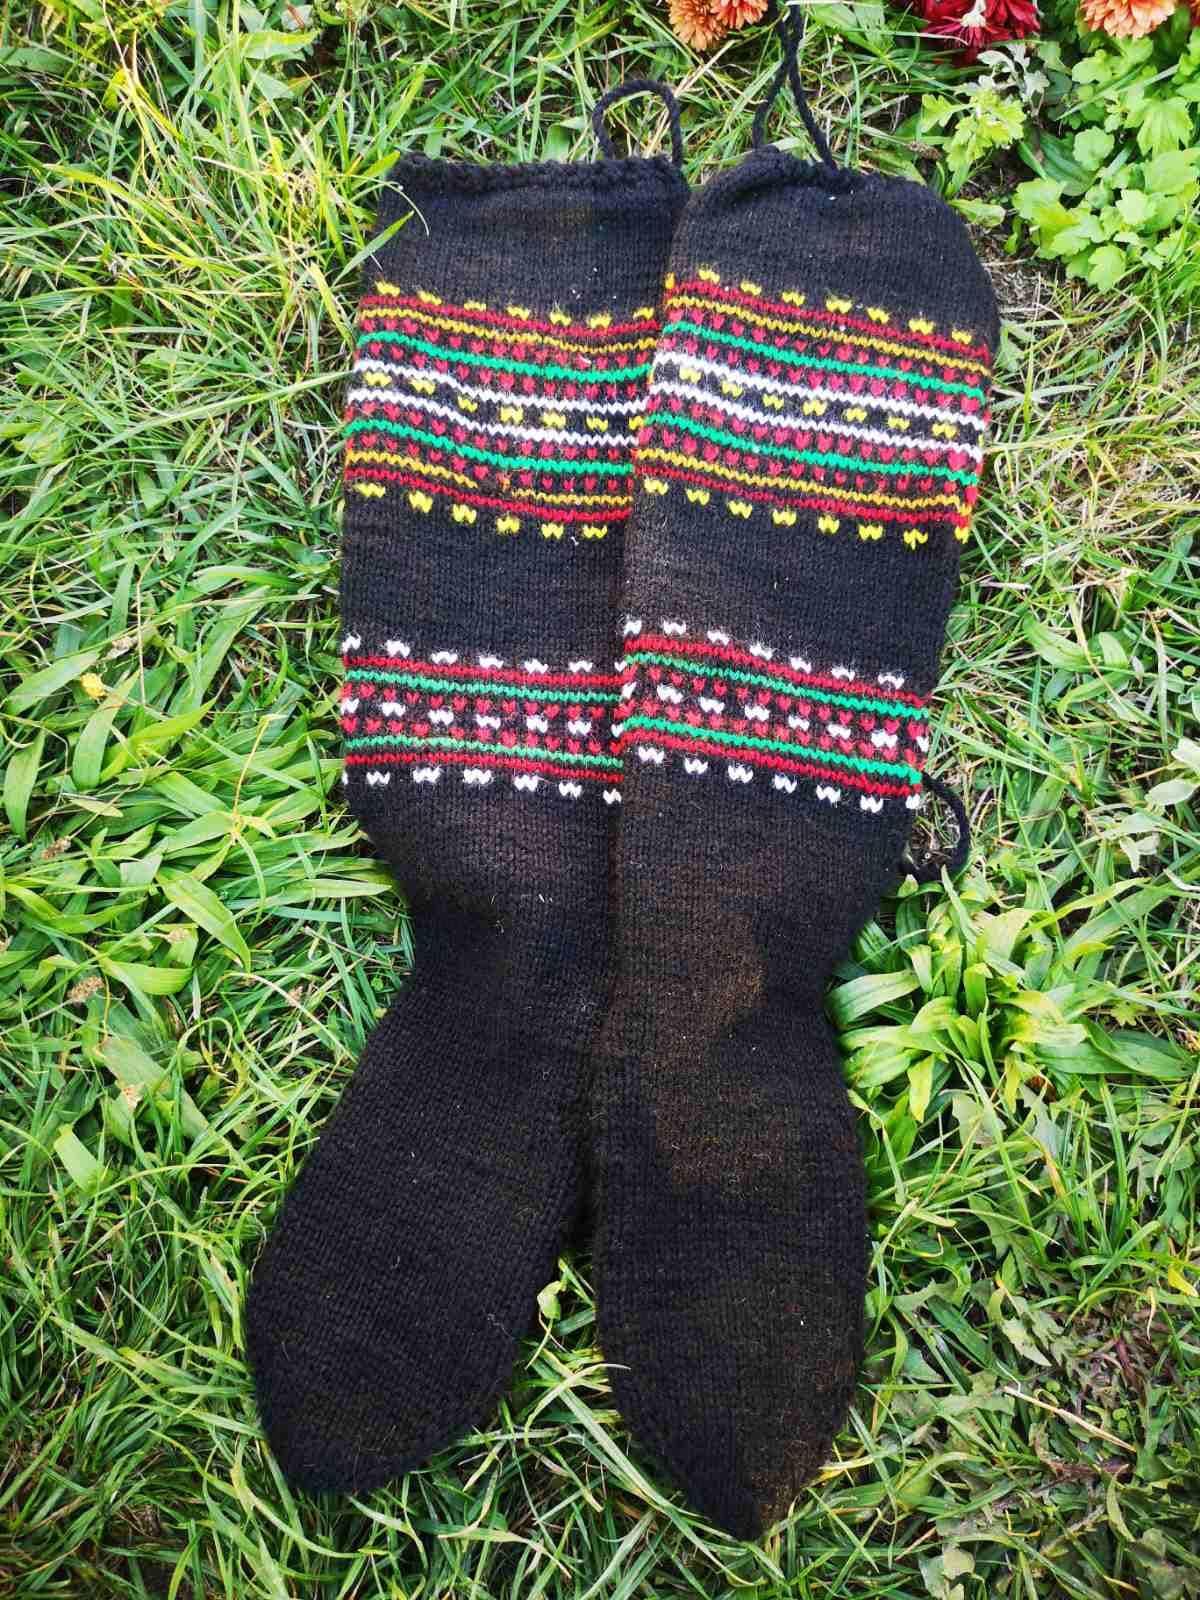 Men's 1920s Style Ties, Neck Ties & Bowties Hand Knitted Old Ethnic Mens Socks, Skopska Blatija Socks $19.99 AT vintagedancer.com